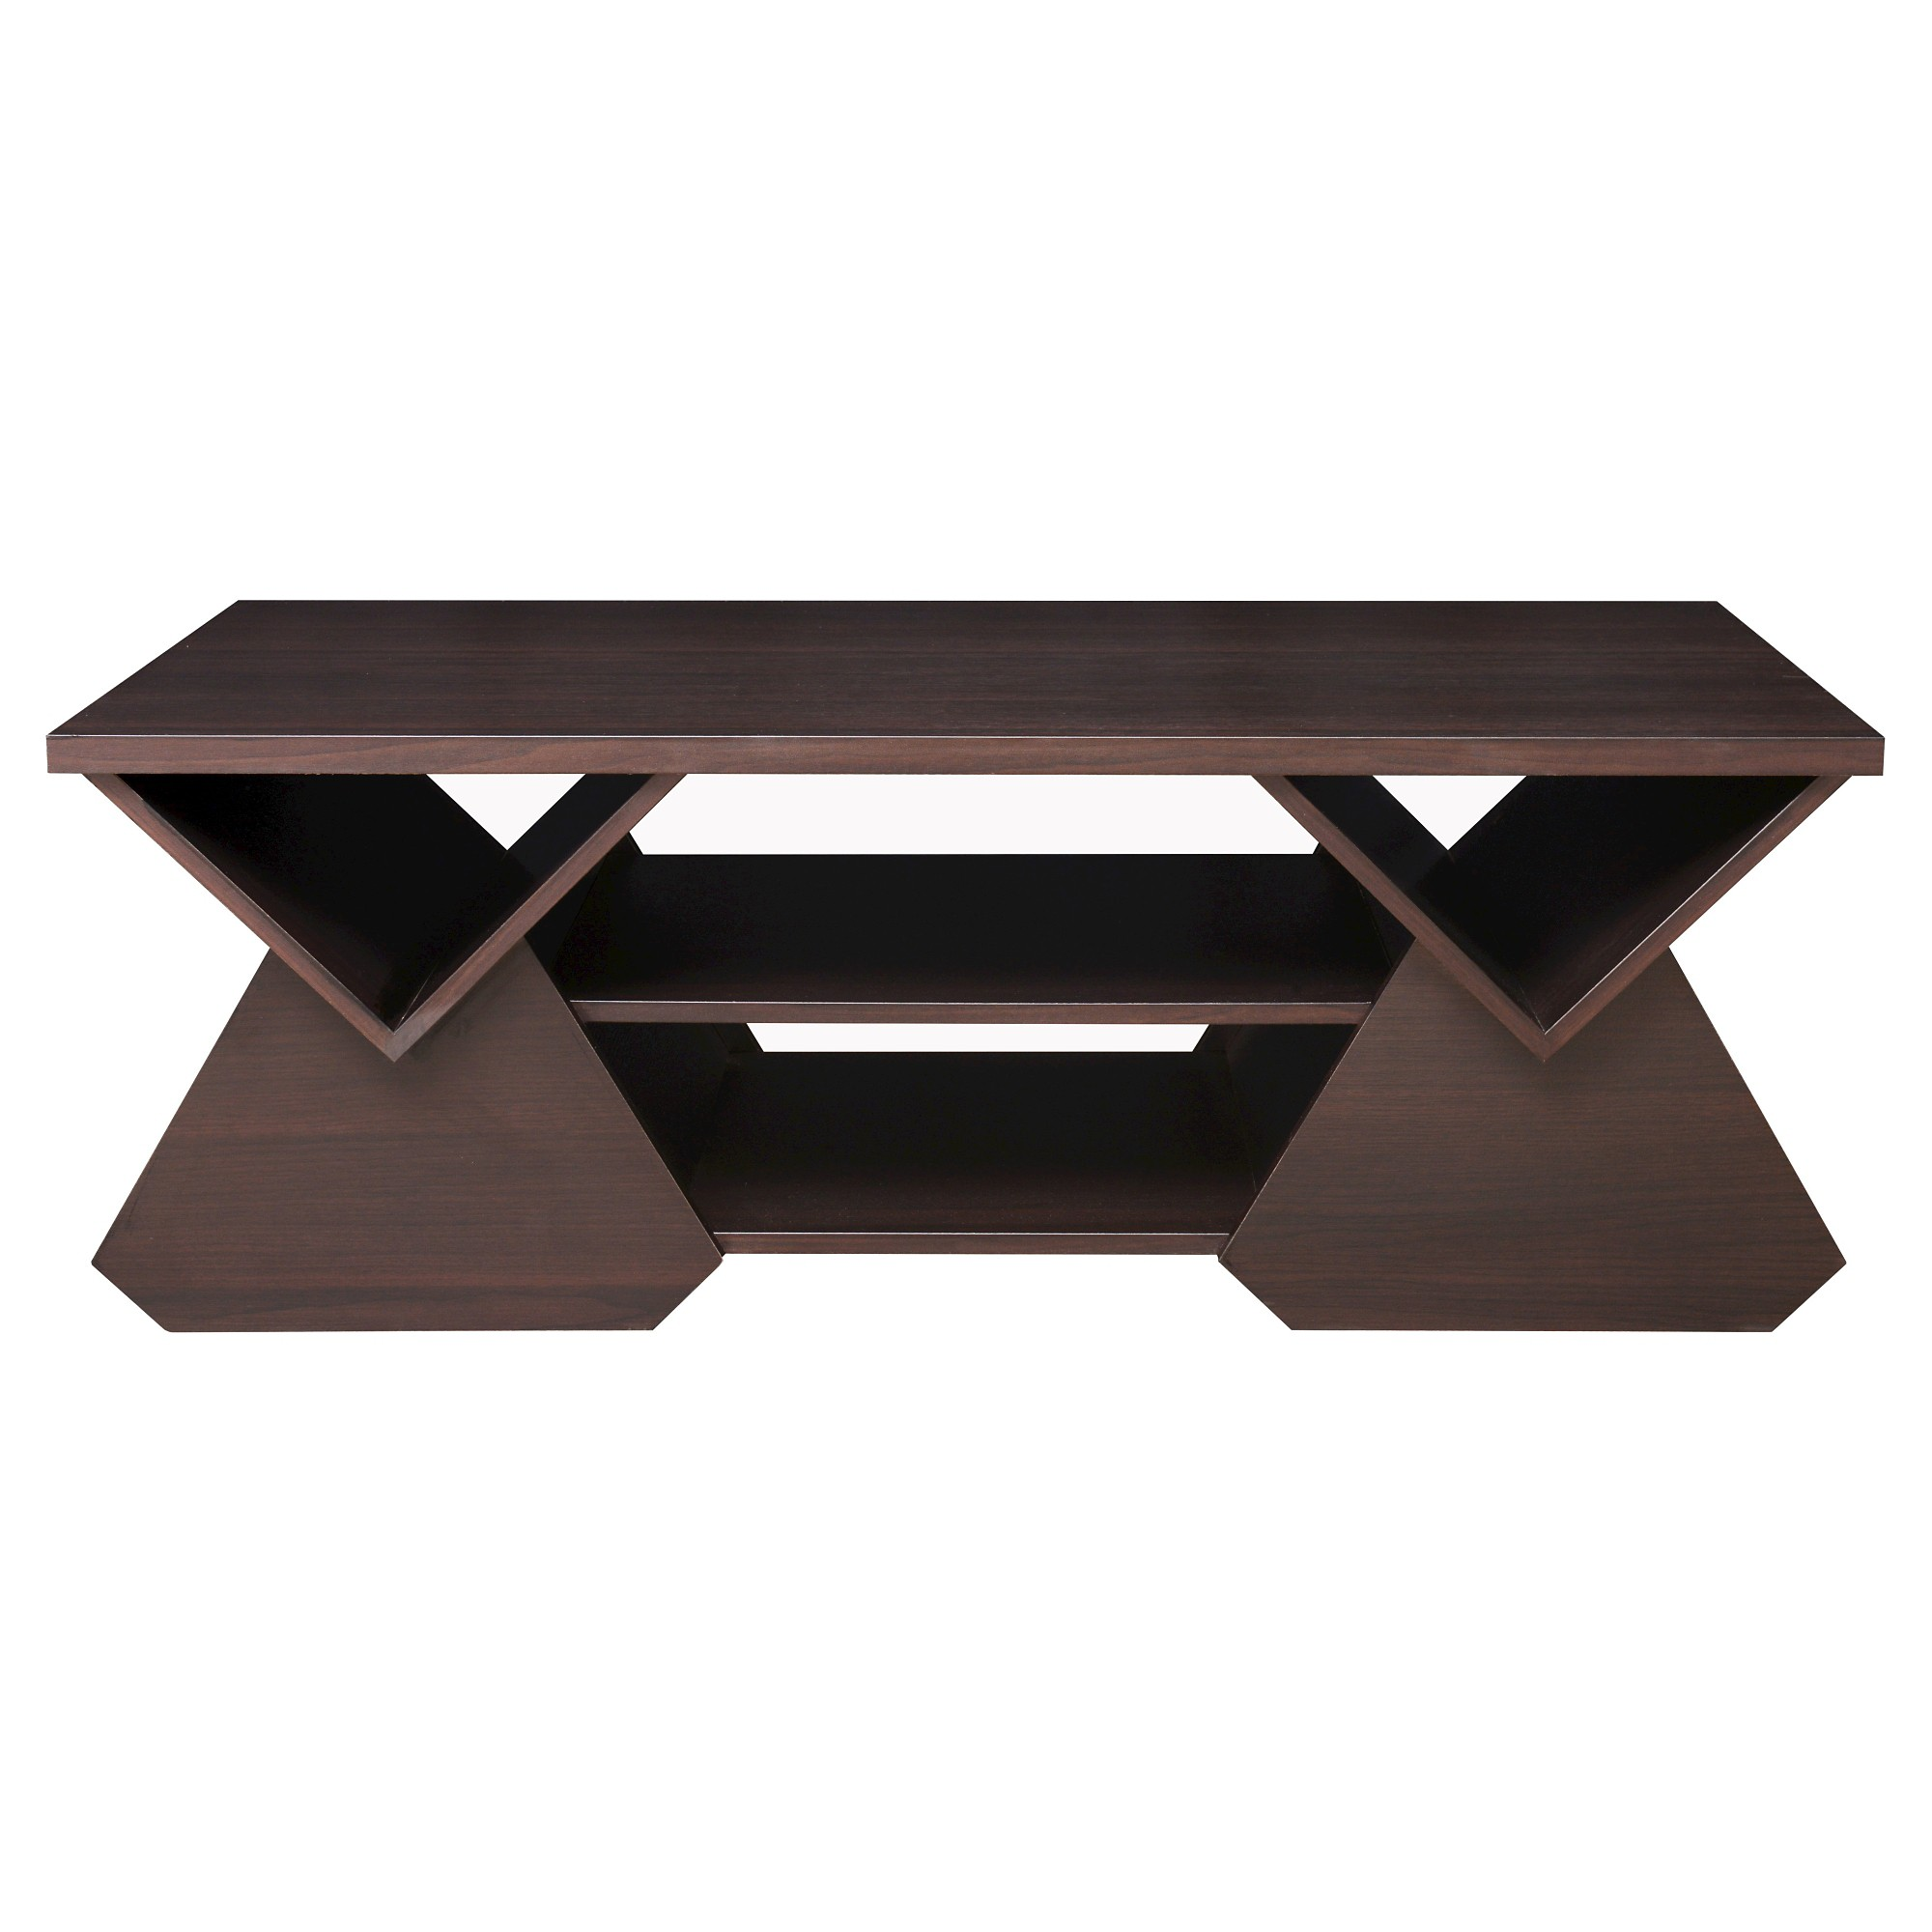 Katy Unique Geometric Open Shelves Coffee Table Espresso Homes Inside Out Geometric Coffee Table Coffee Table Modern Coffee Tables [ 2000 x 2000 Pixel ]